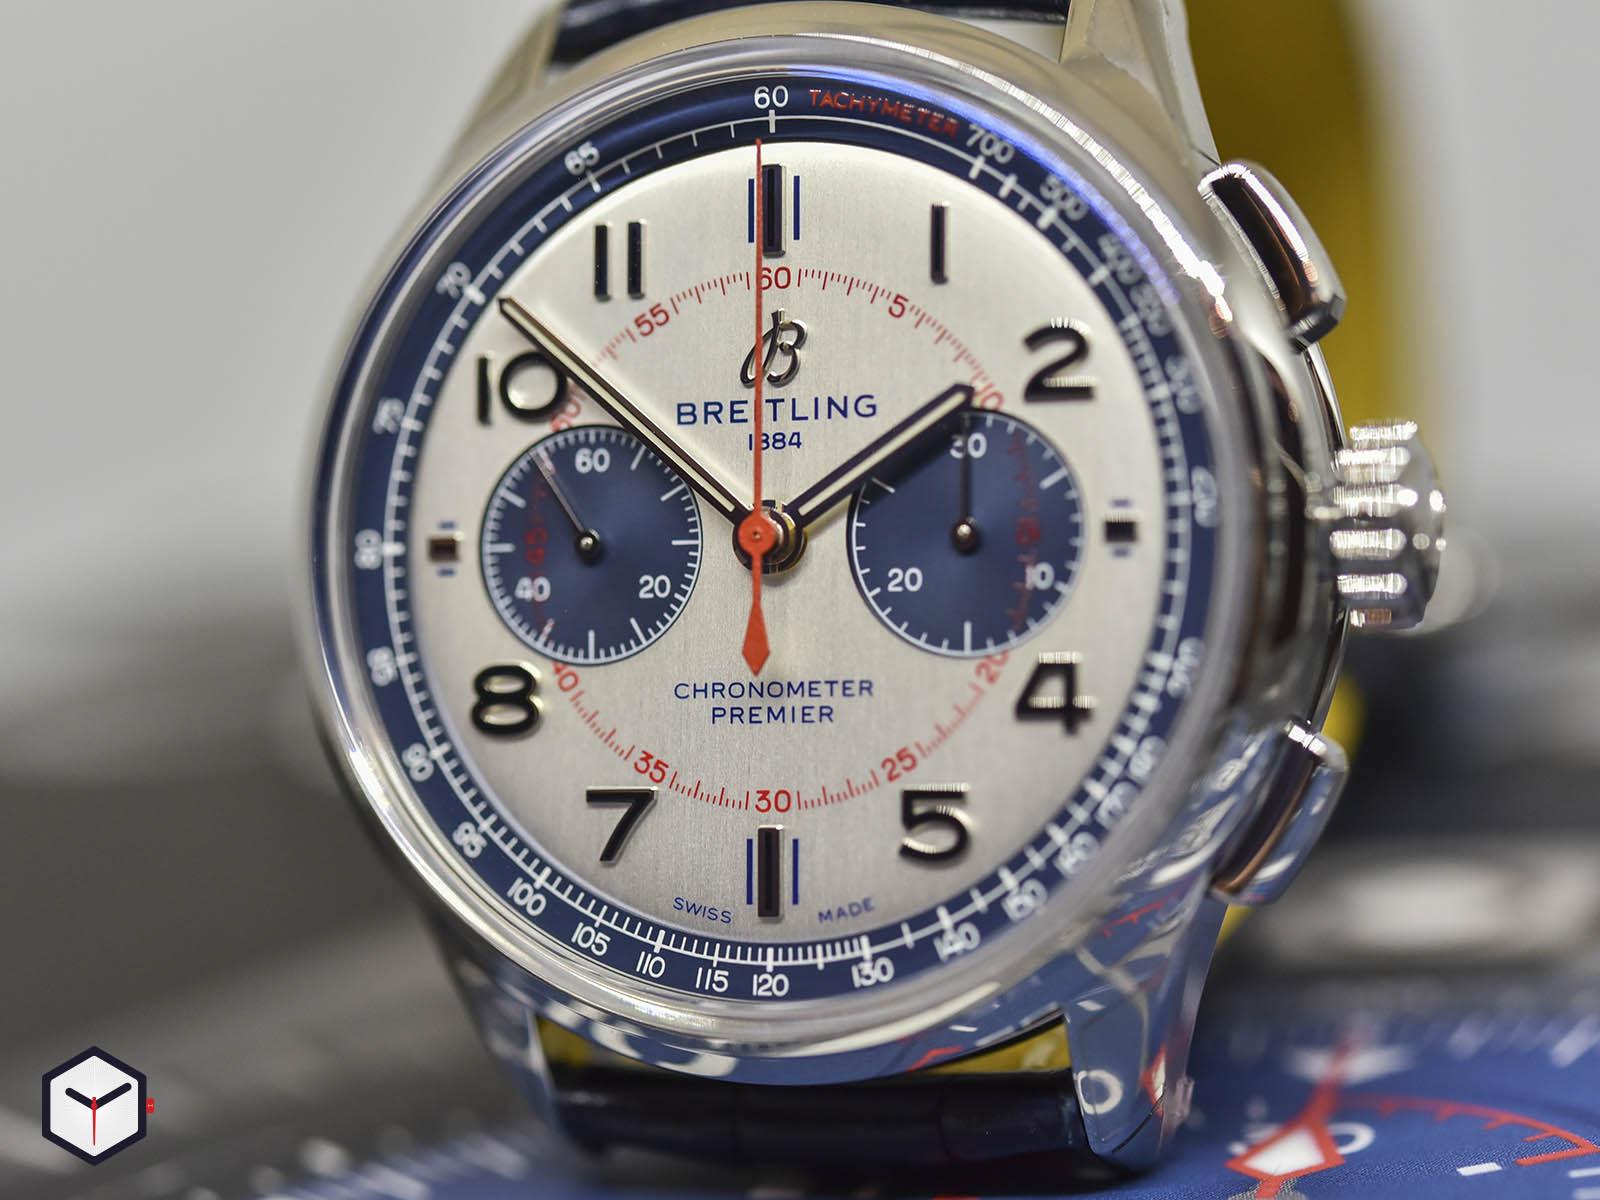 ab0118a71g1p1-breitling-premier-b01-chronograph-42-bentley-mulliner-3.jpg